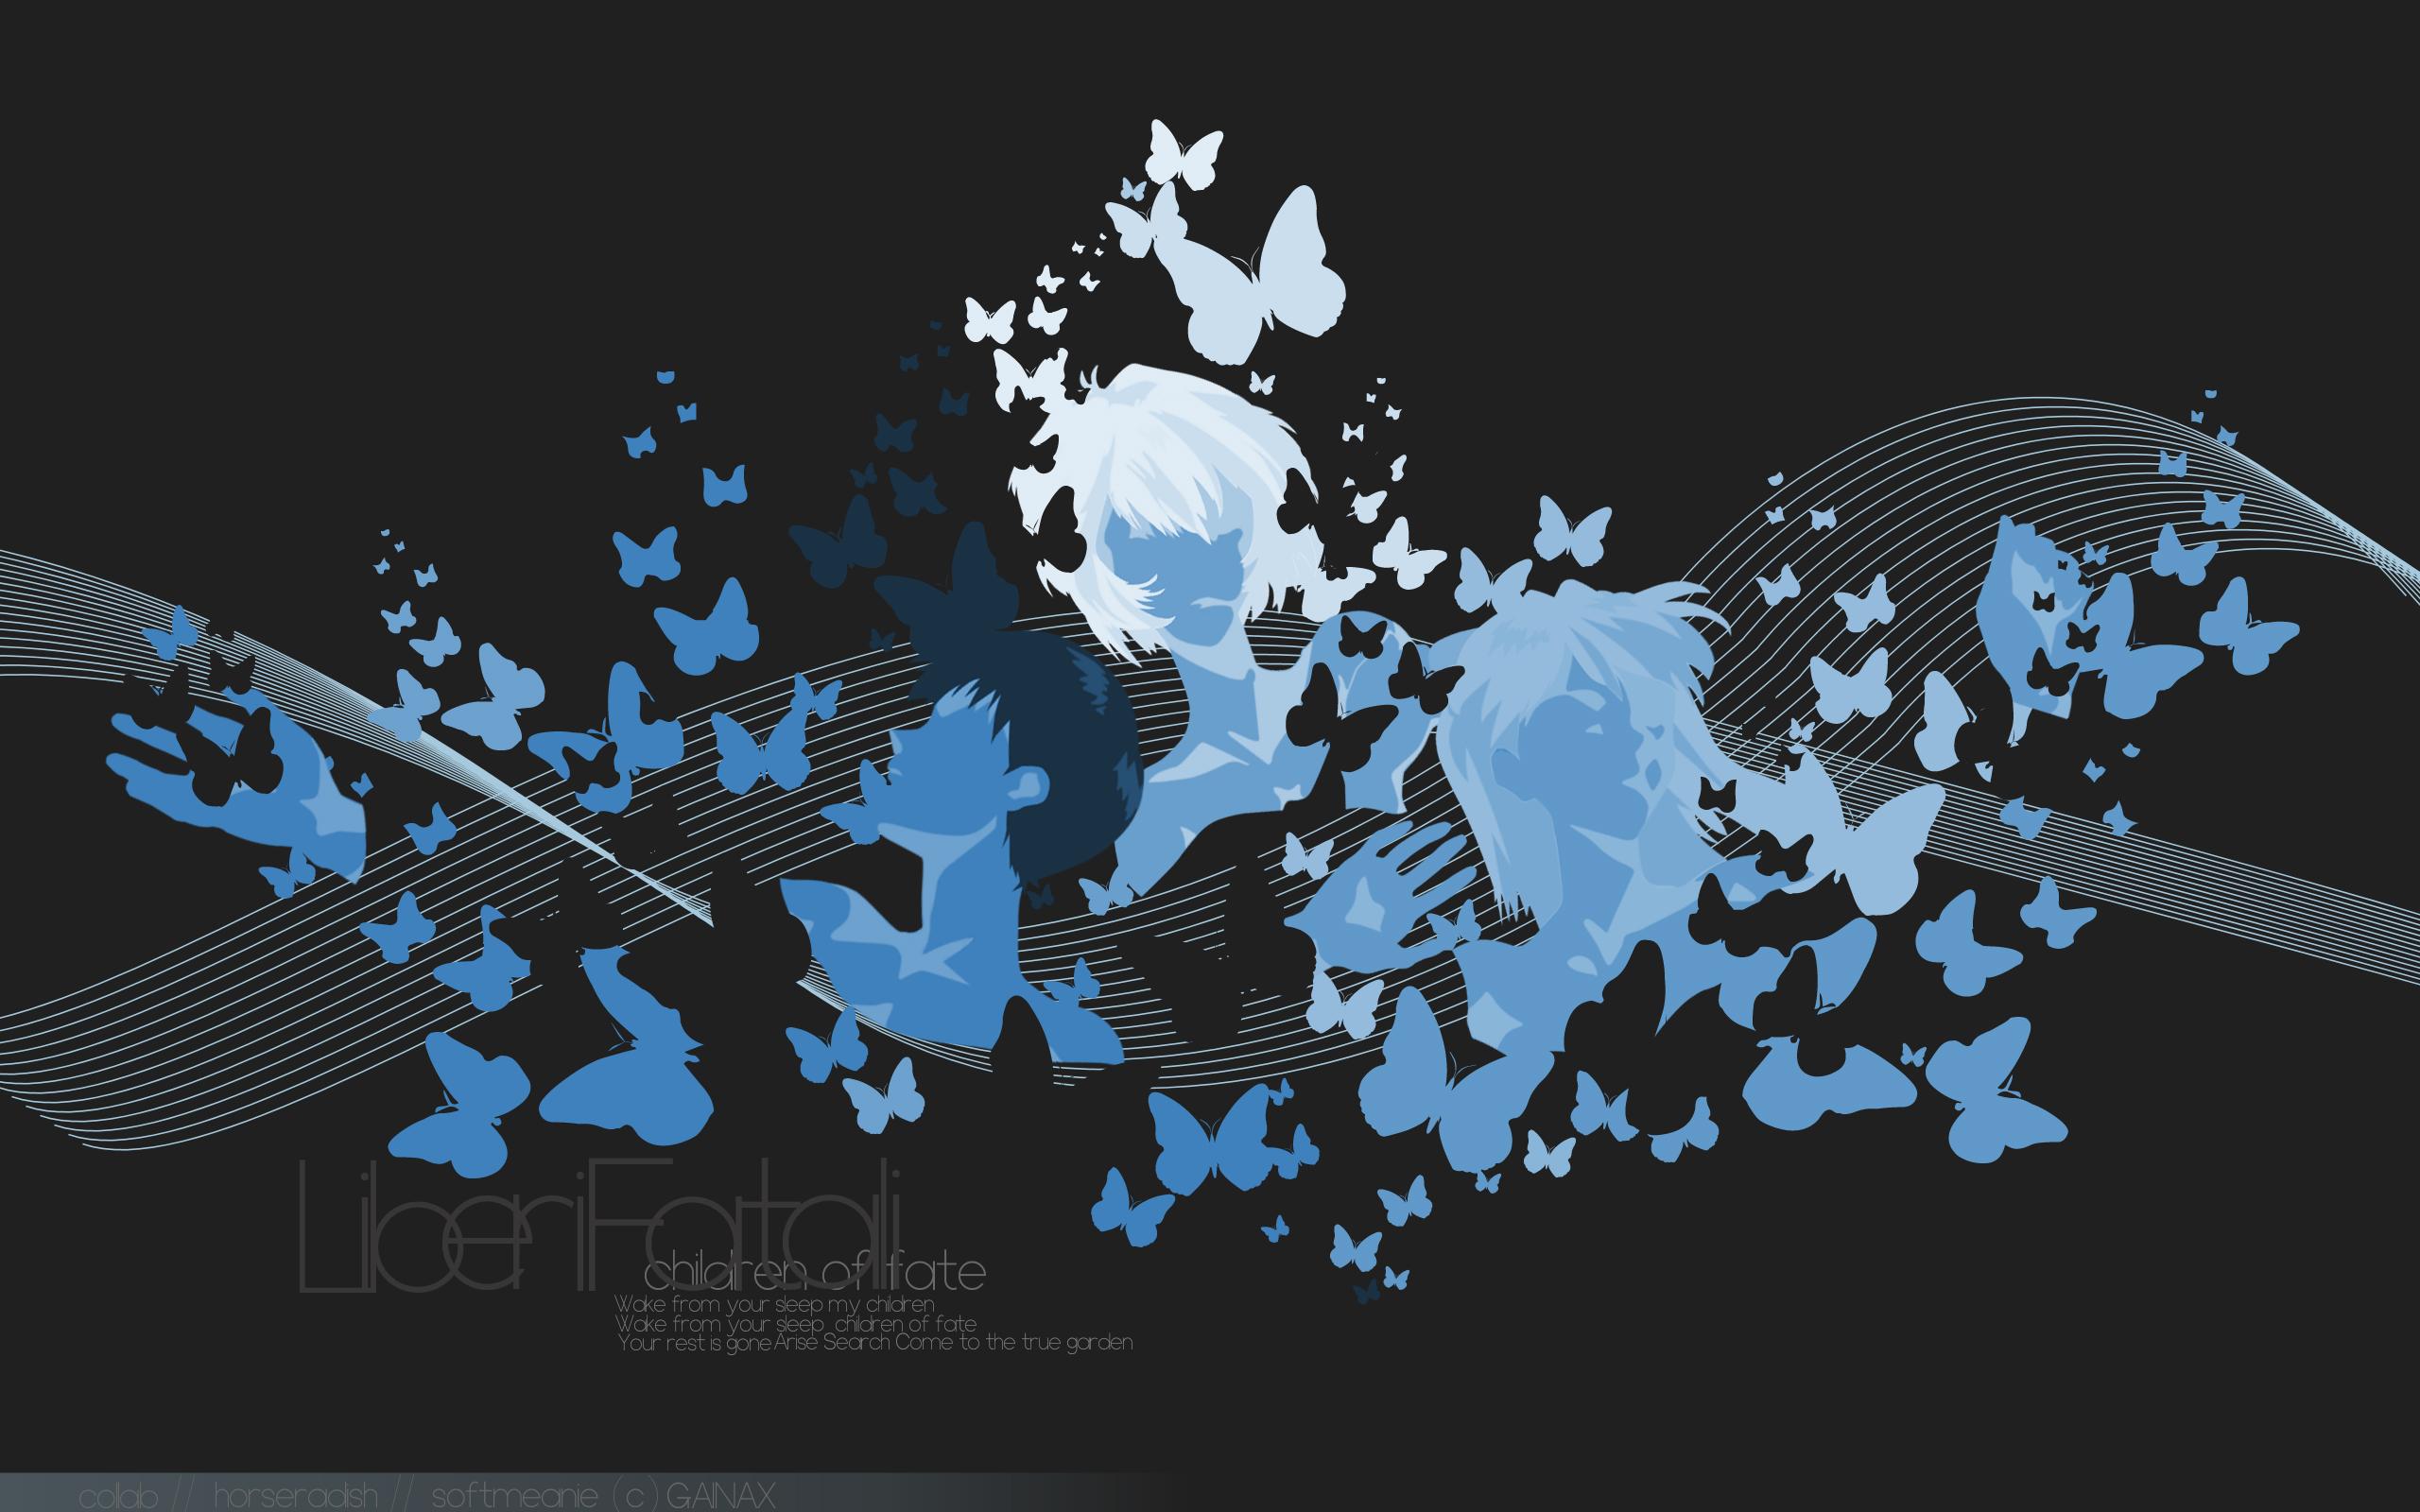 Neon Genesis Evangelion High Definition Wallpaper 04 Imagez Only 2560x1600